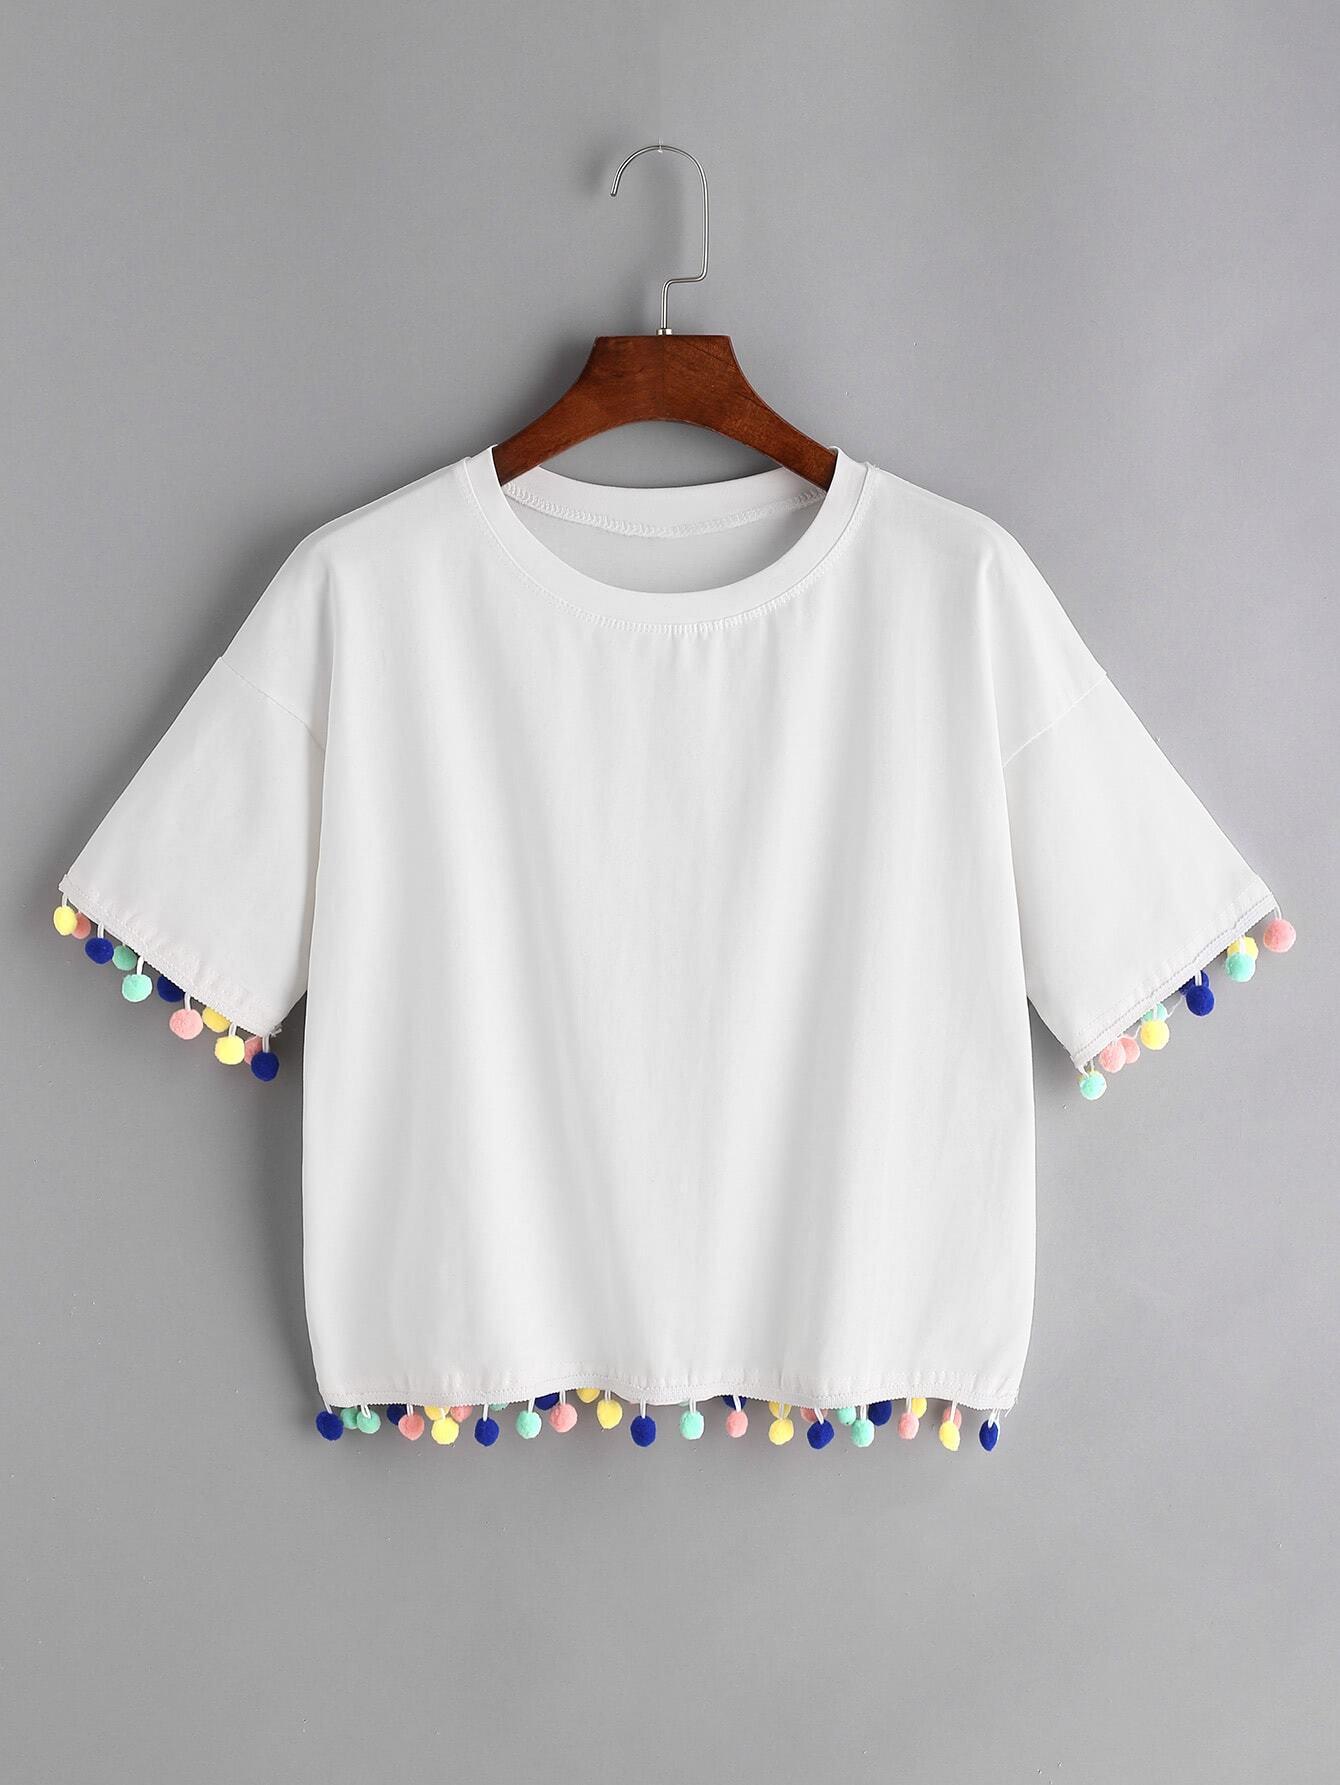 Купить Белая капля плеча Pom Pom футболка, null, SheIn